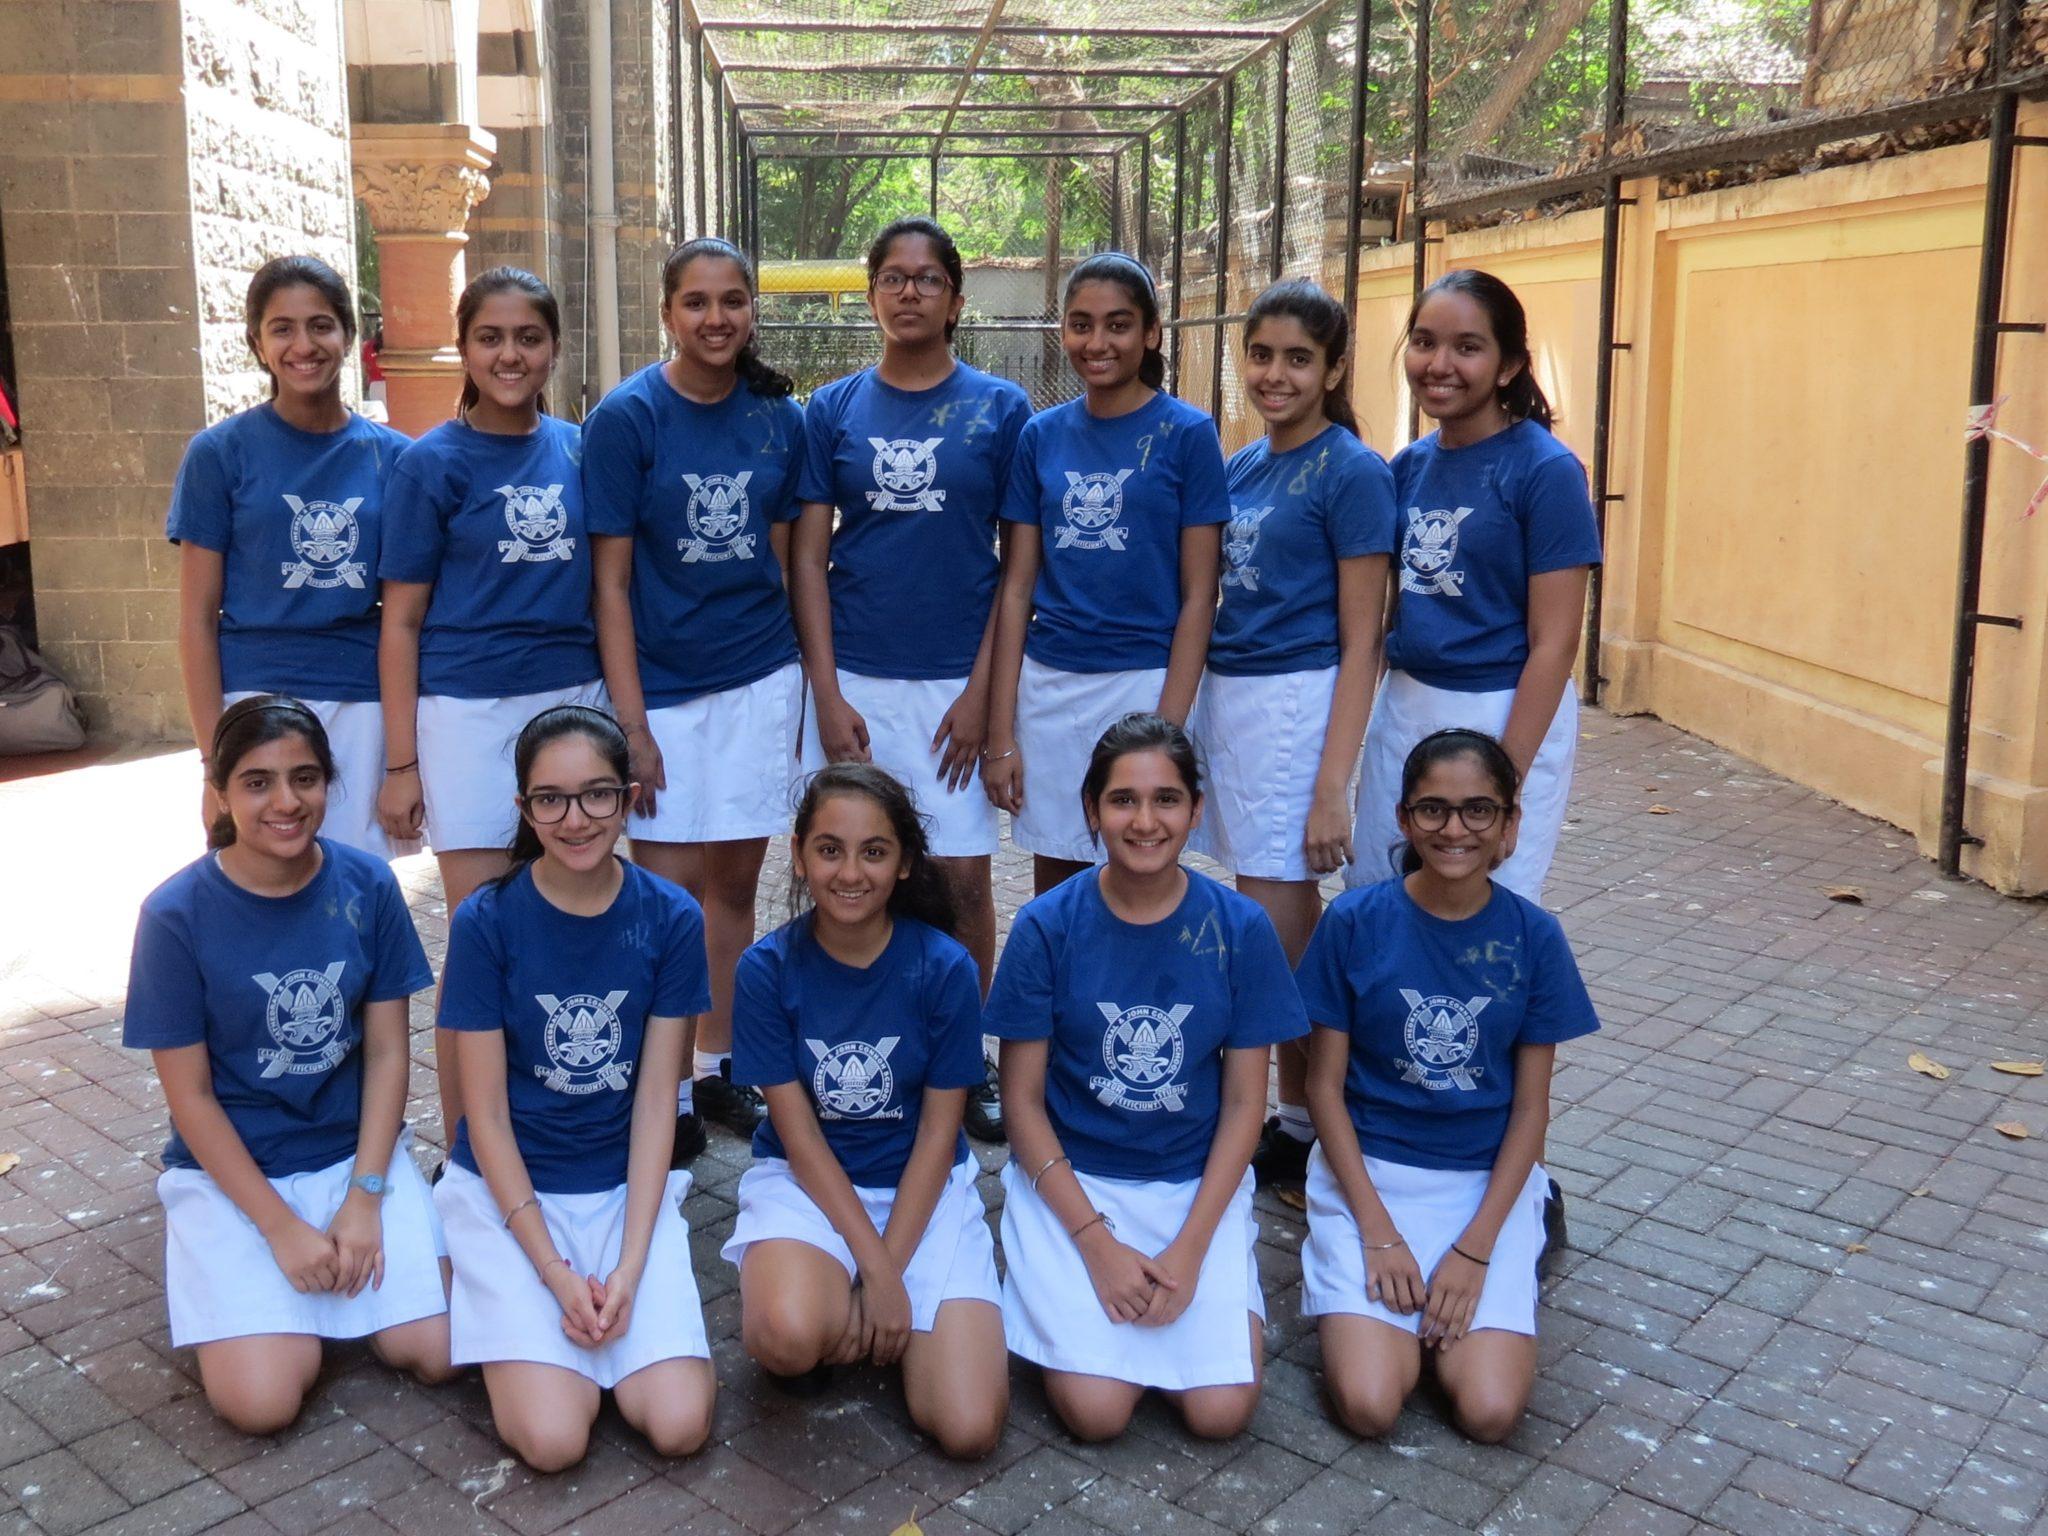 Inter House Throwball Girls